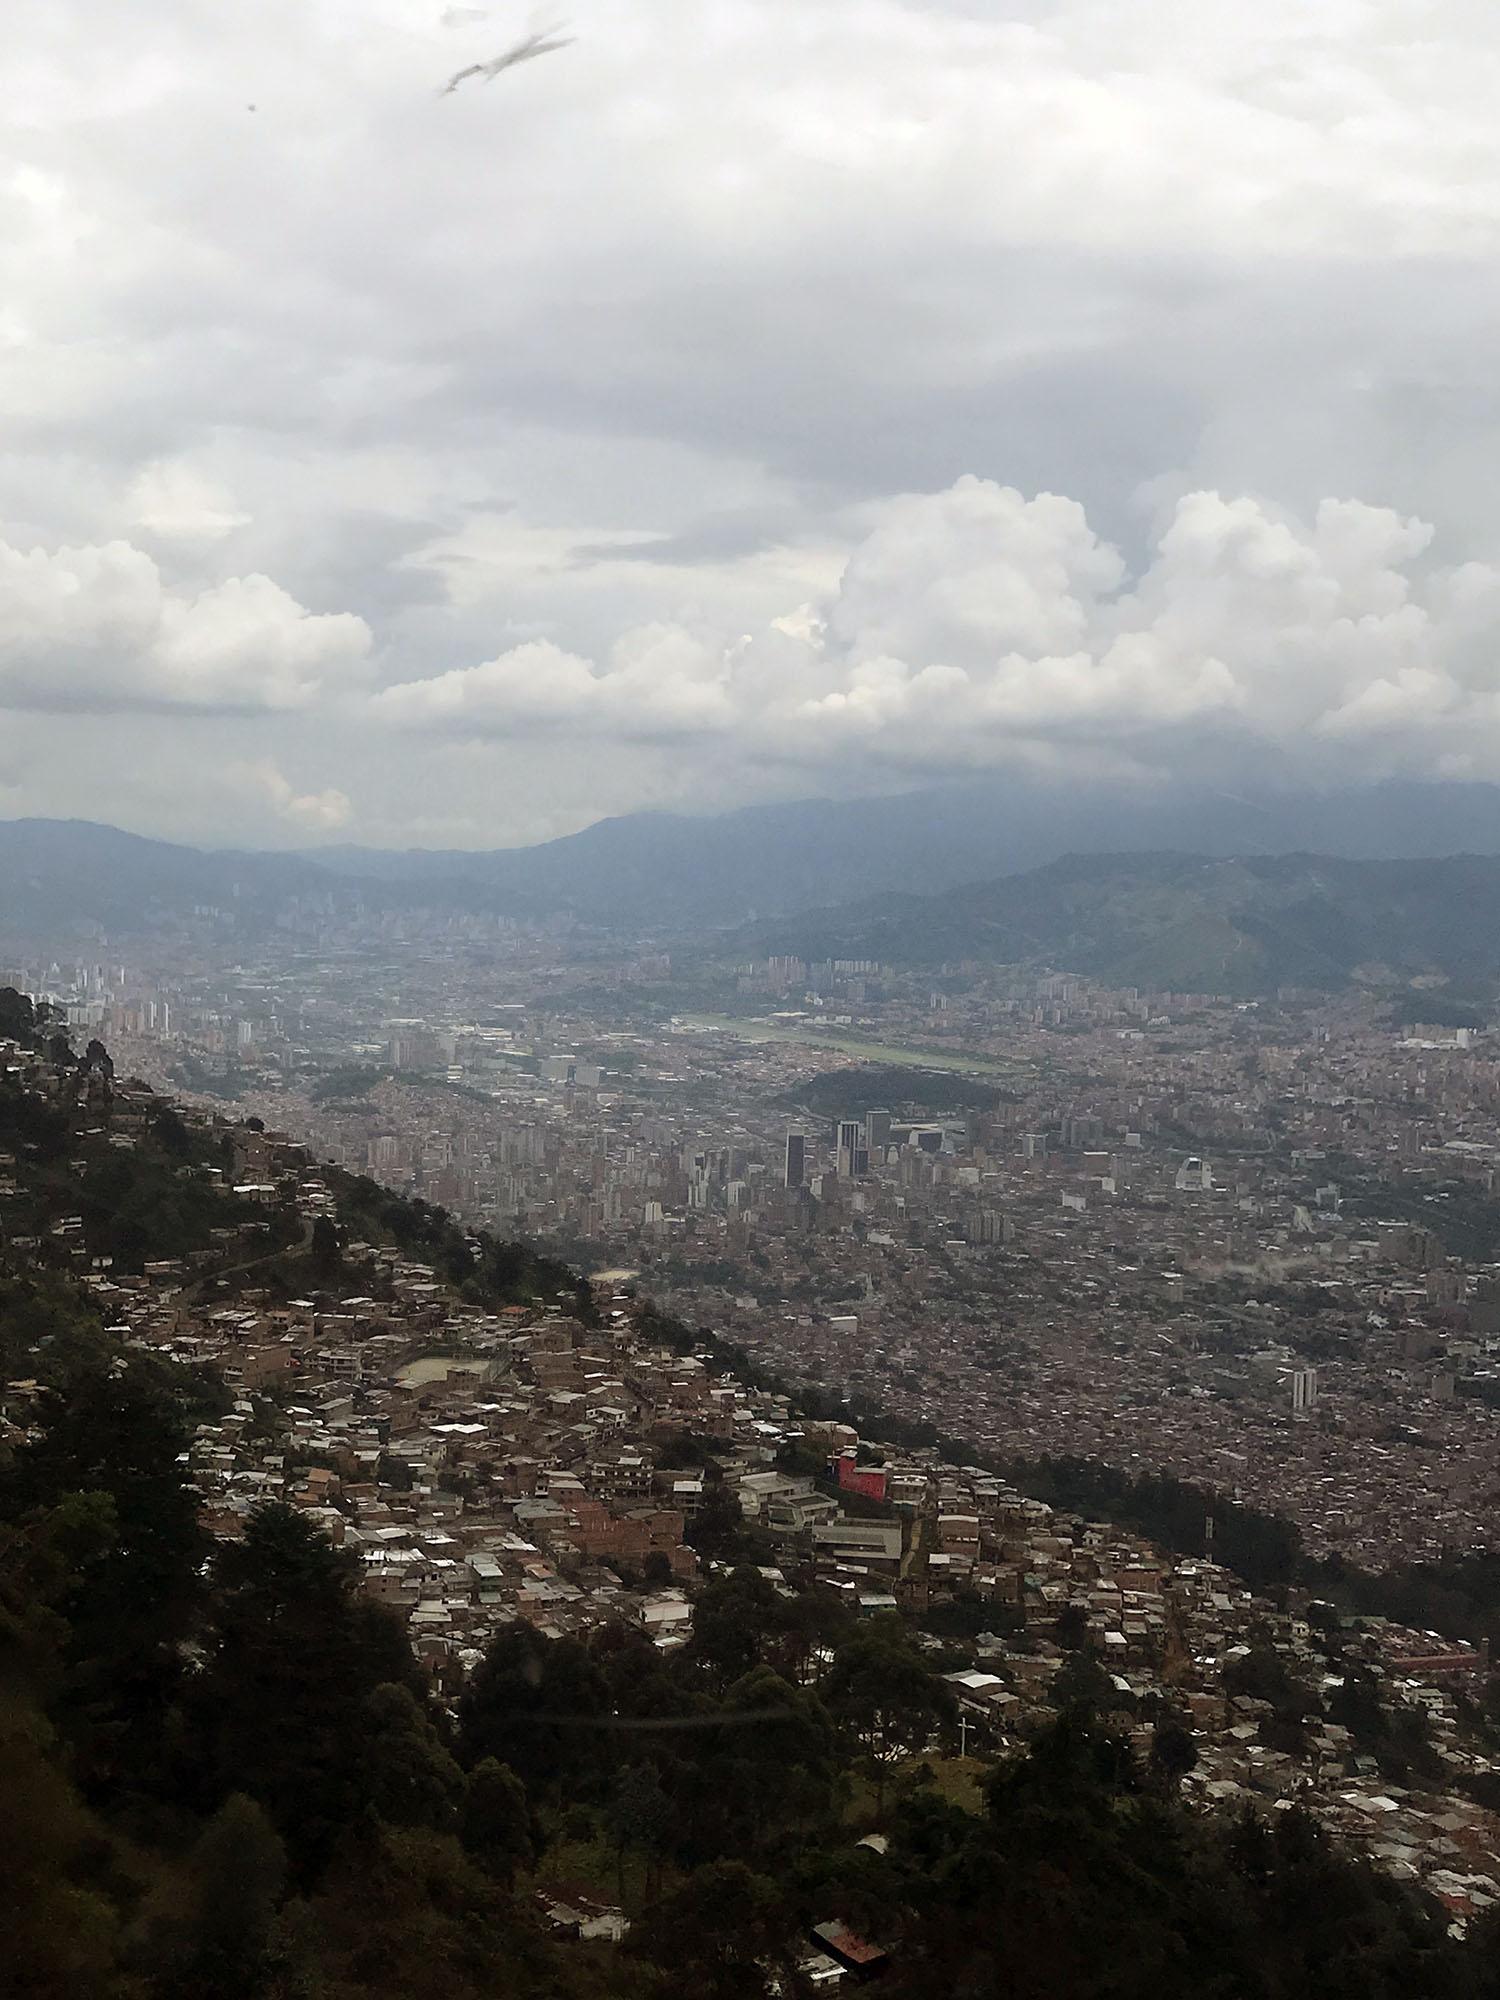 Vista of Medellin high above the city